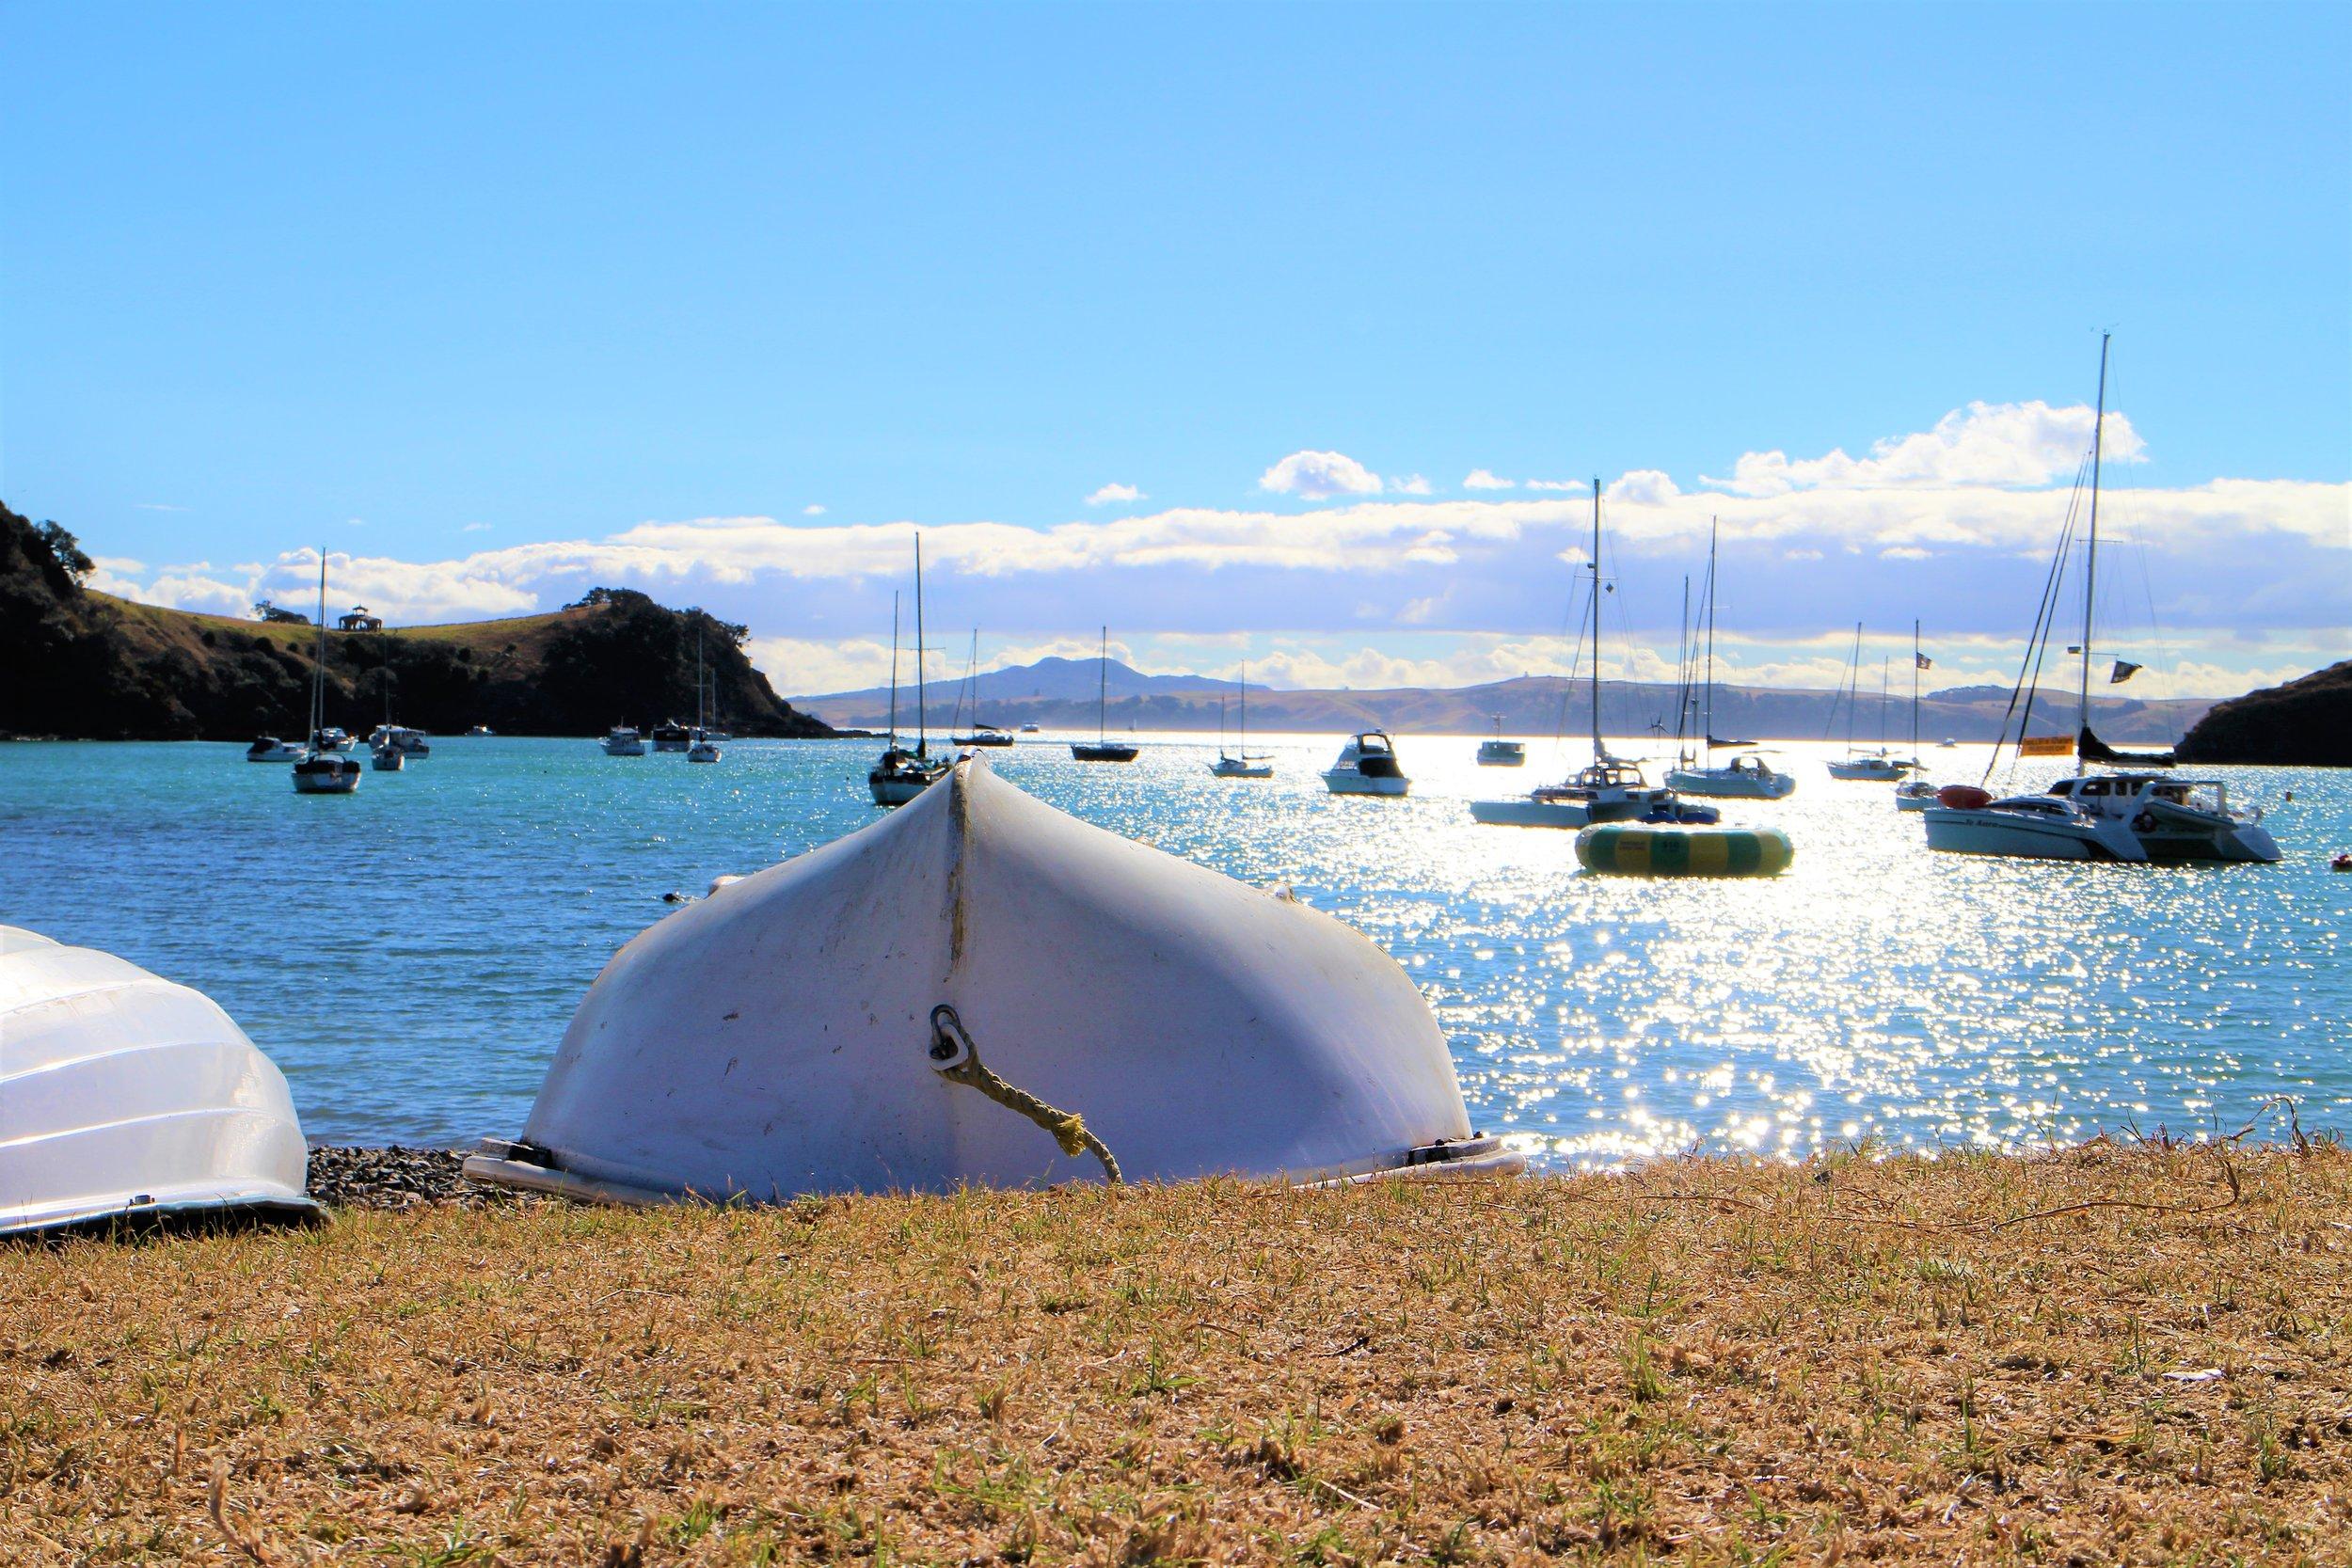 Sailboats off Waiheke Island, New Zealand